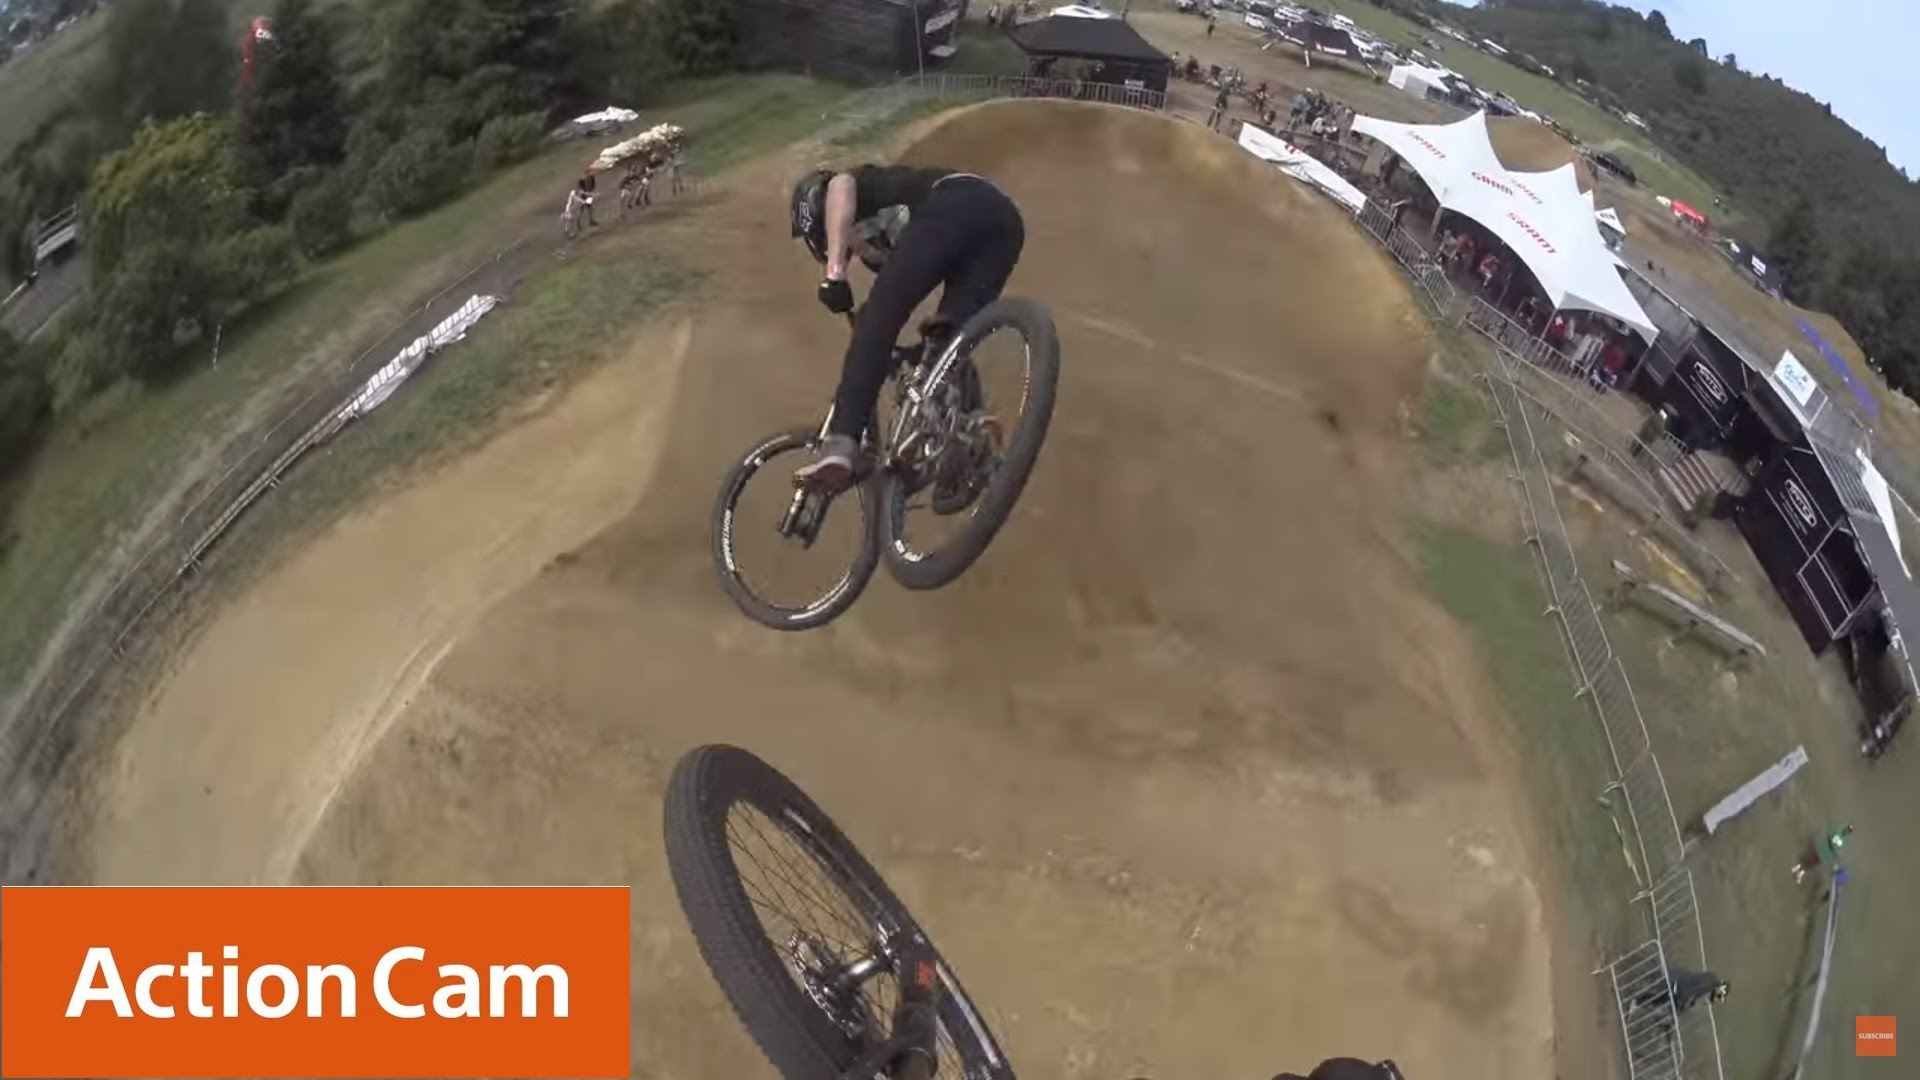 Action Cam | Crankworx Rotorua Slopestyle Course Preview | Brett Rheeder & Cam McCaul | Sony